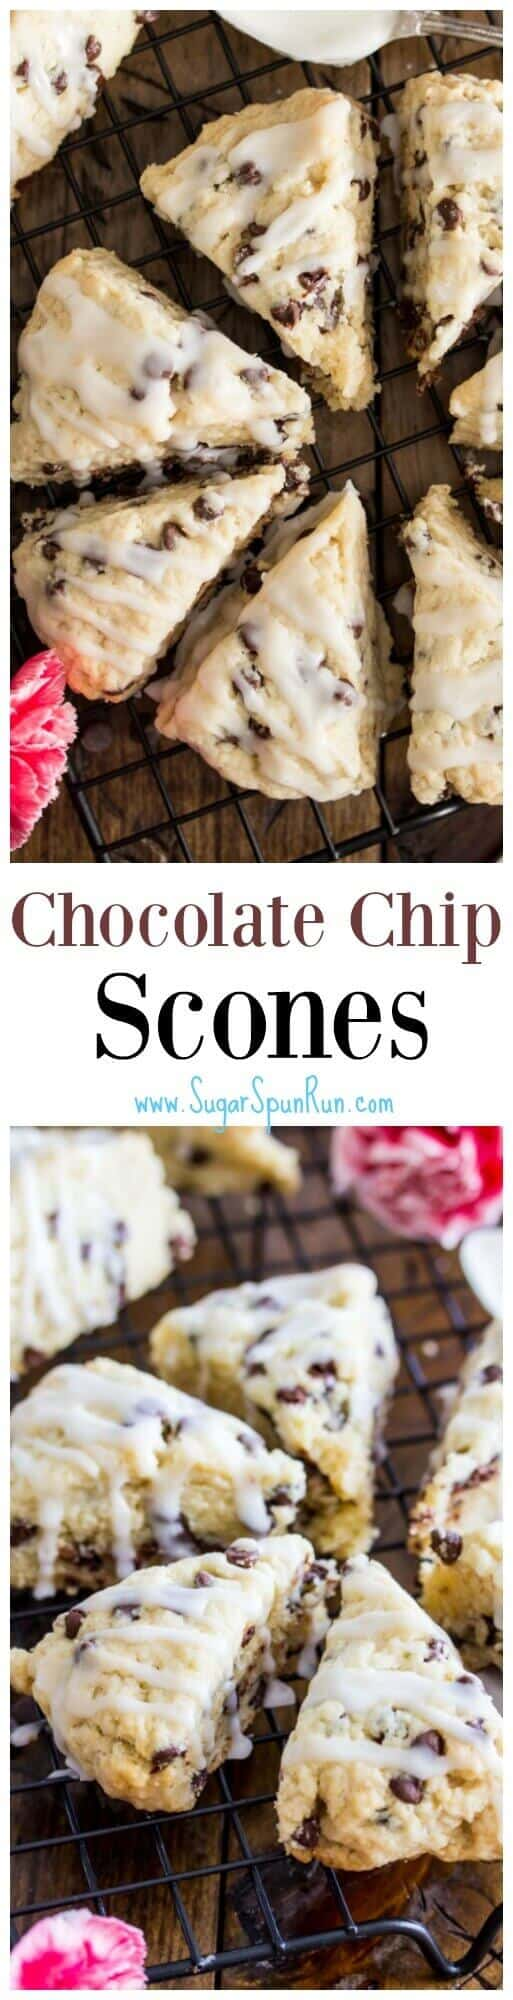 Mini Chocolate Chip Scones - Sugar Spun Run